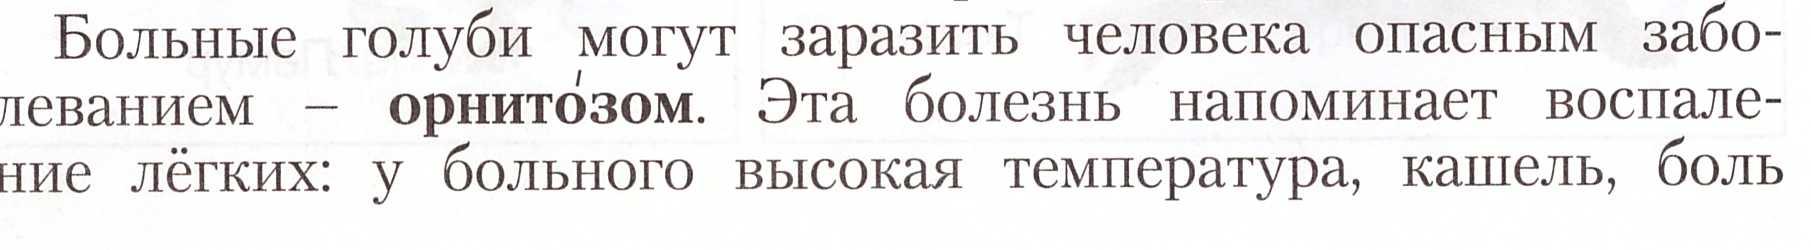 C:\Users\Наталья\Desktop\1.jpeg